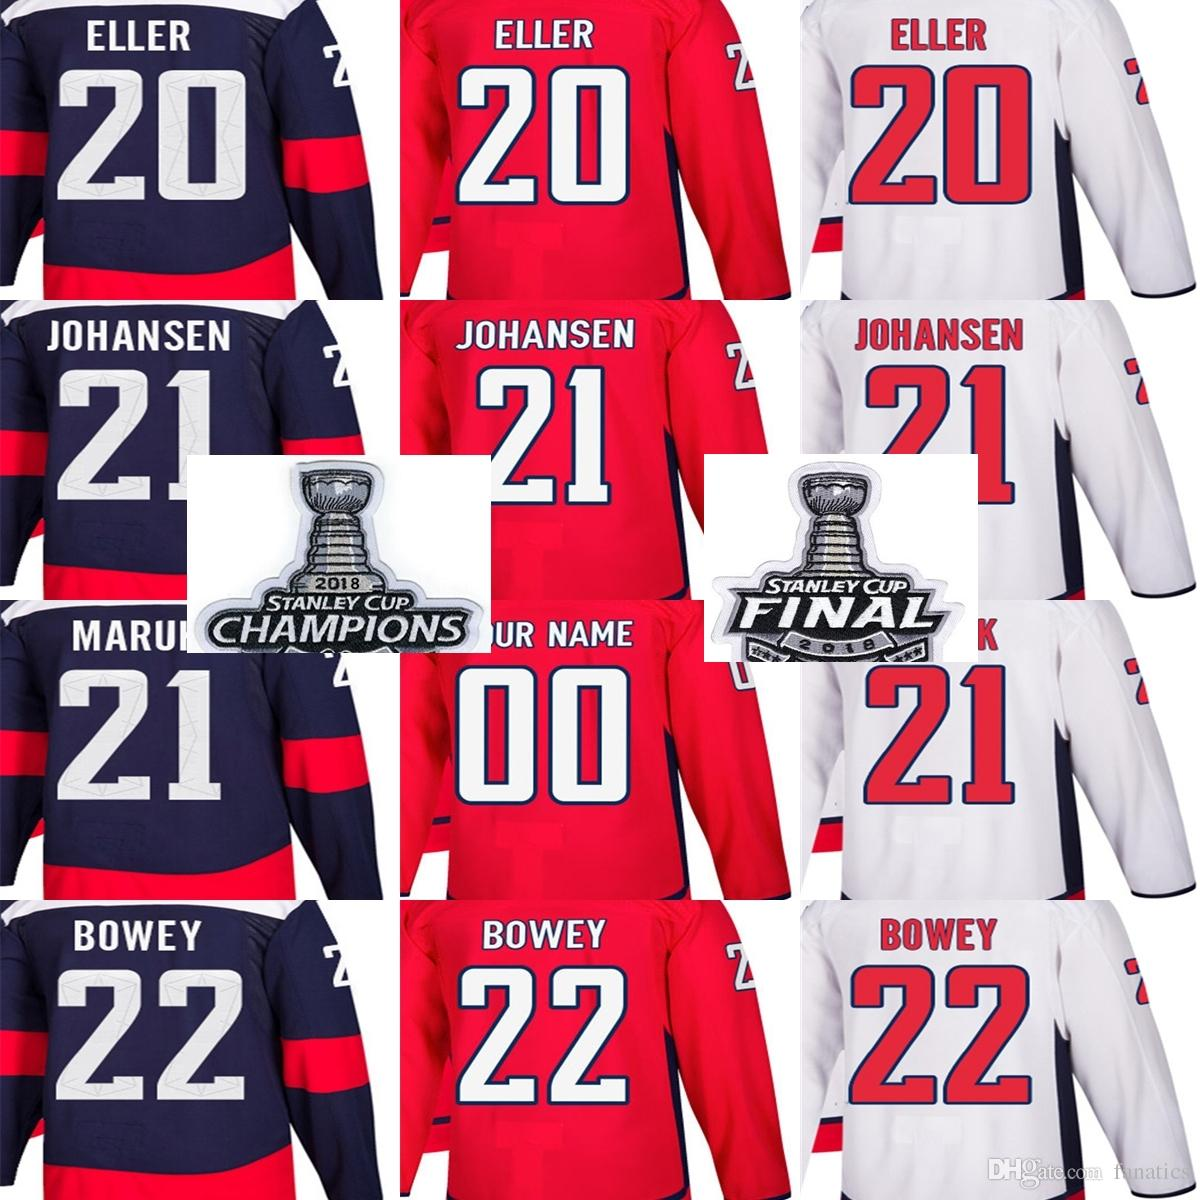 781da9965 2018 Stanley Cup Champions Final Patch Men Washington Capitals Lars ...